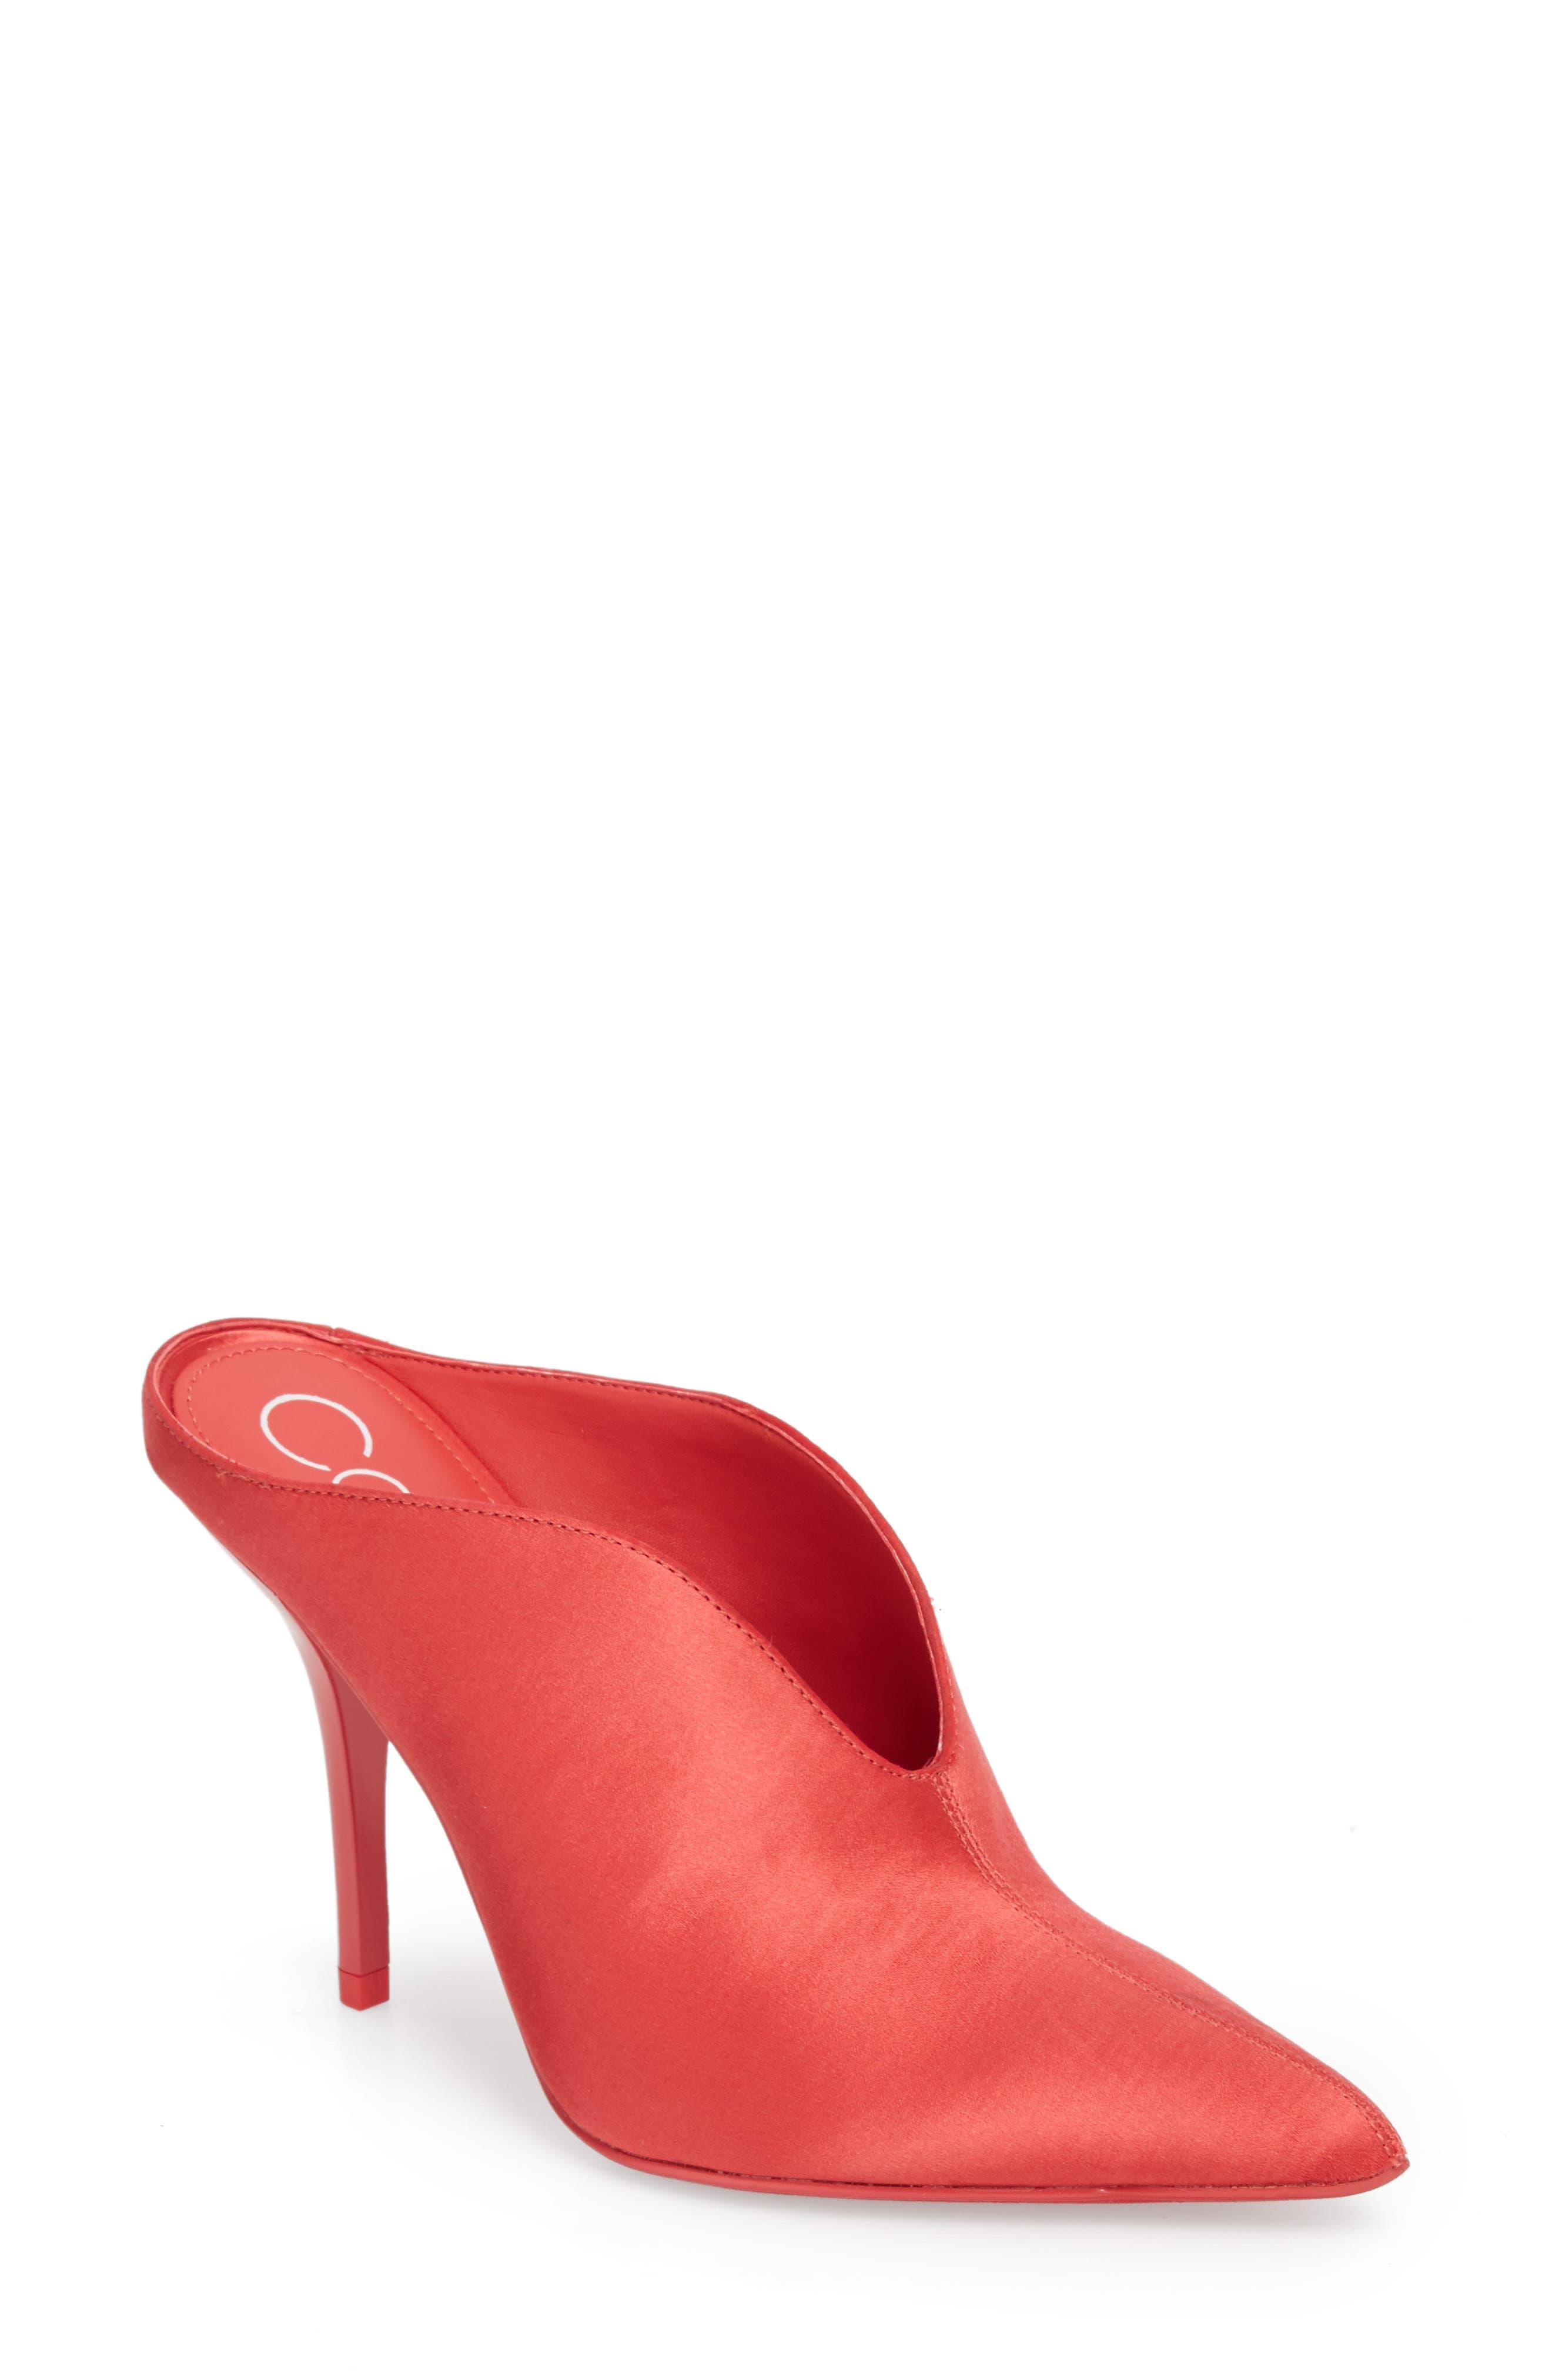 Mallie Pointy Toe Mule,                         Main,                         color, Rose Quartz Fabric